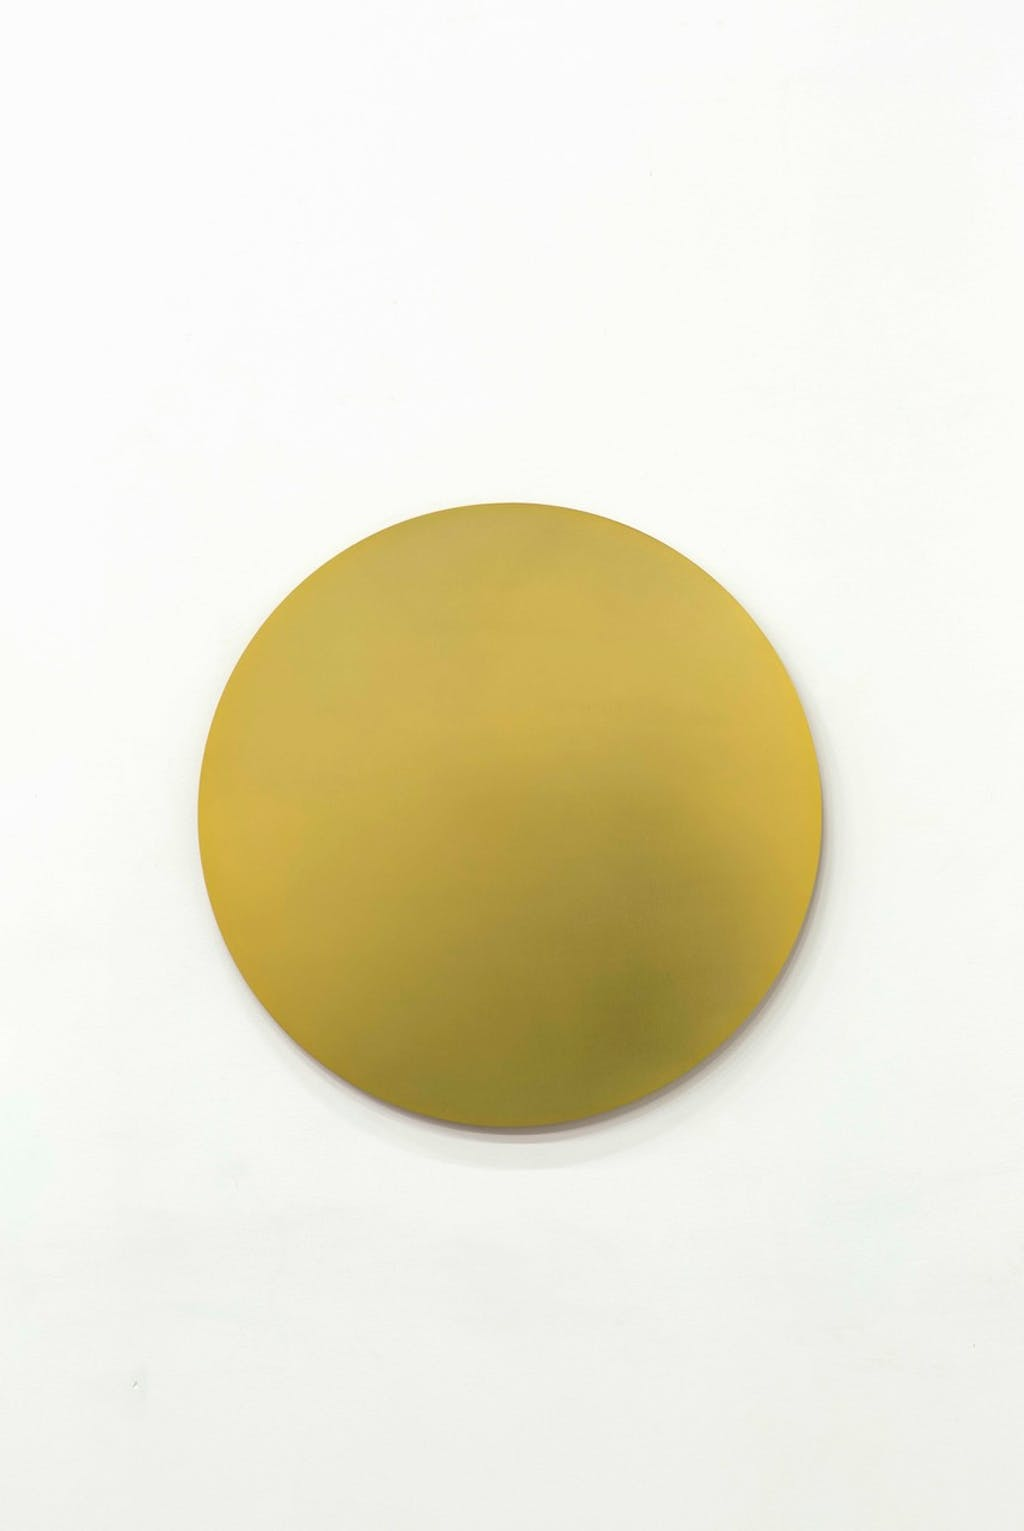 Golden circle - © kamel mennour